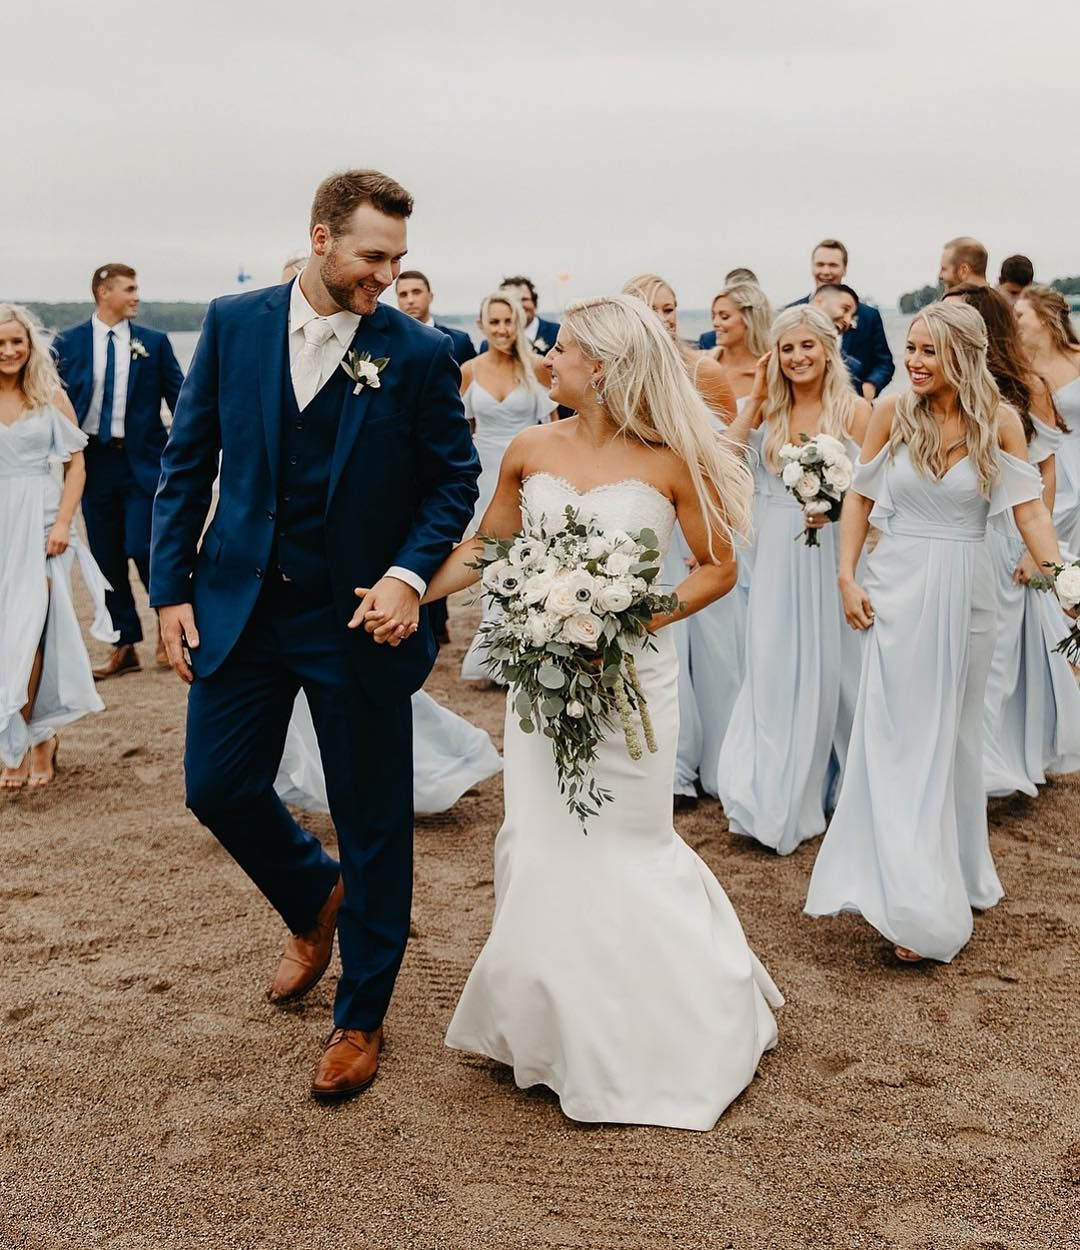 Janelle Elise On Instagram The Dusty Blue Bridesmaid Dresses And Navy Su Blue Bridesmaid Dresses Beach Beach Bridesmaid Dresses Dusty Blue Bridesmaid Dresses